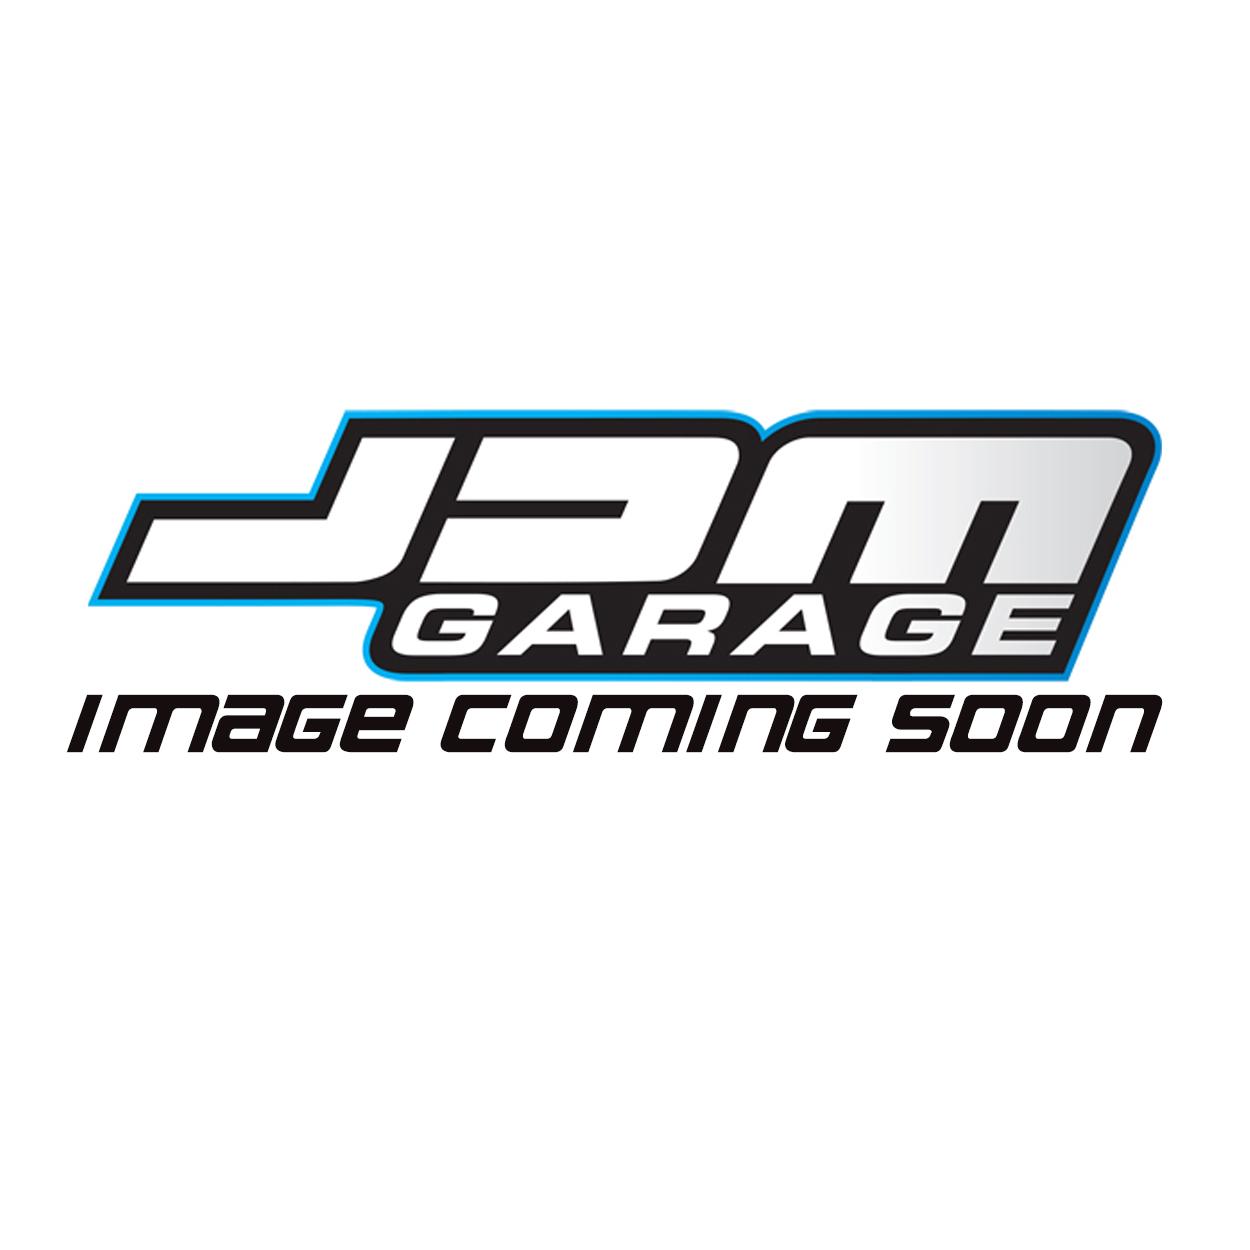 GT2560R Billet Hybrid Turbo - New Unit - Nissan 200sx S14/S15 SR20DET